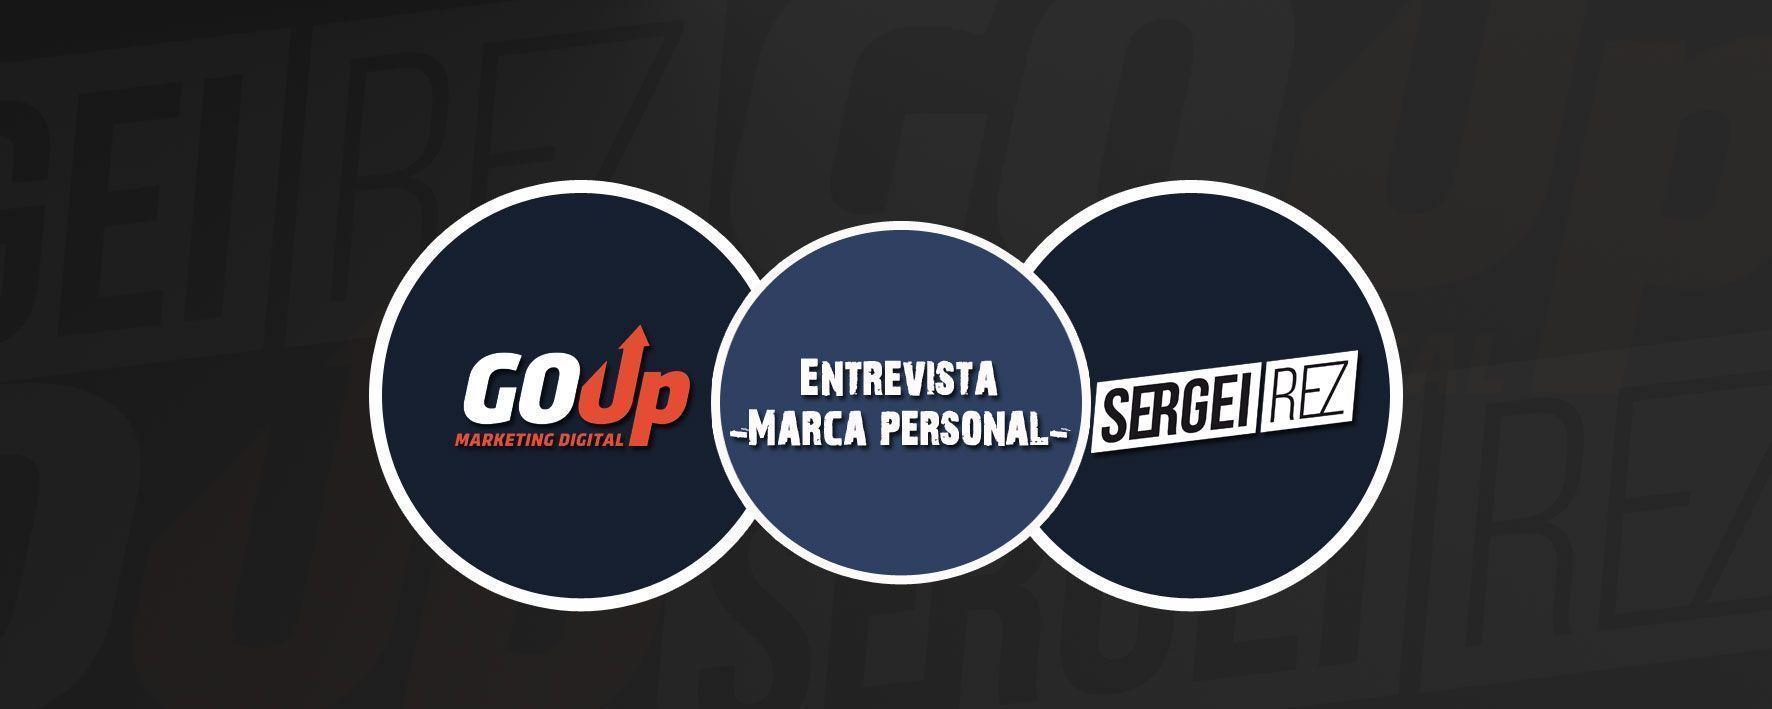 Marca personal- Entrevista a Sergei Rez- Personal branding